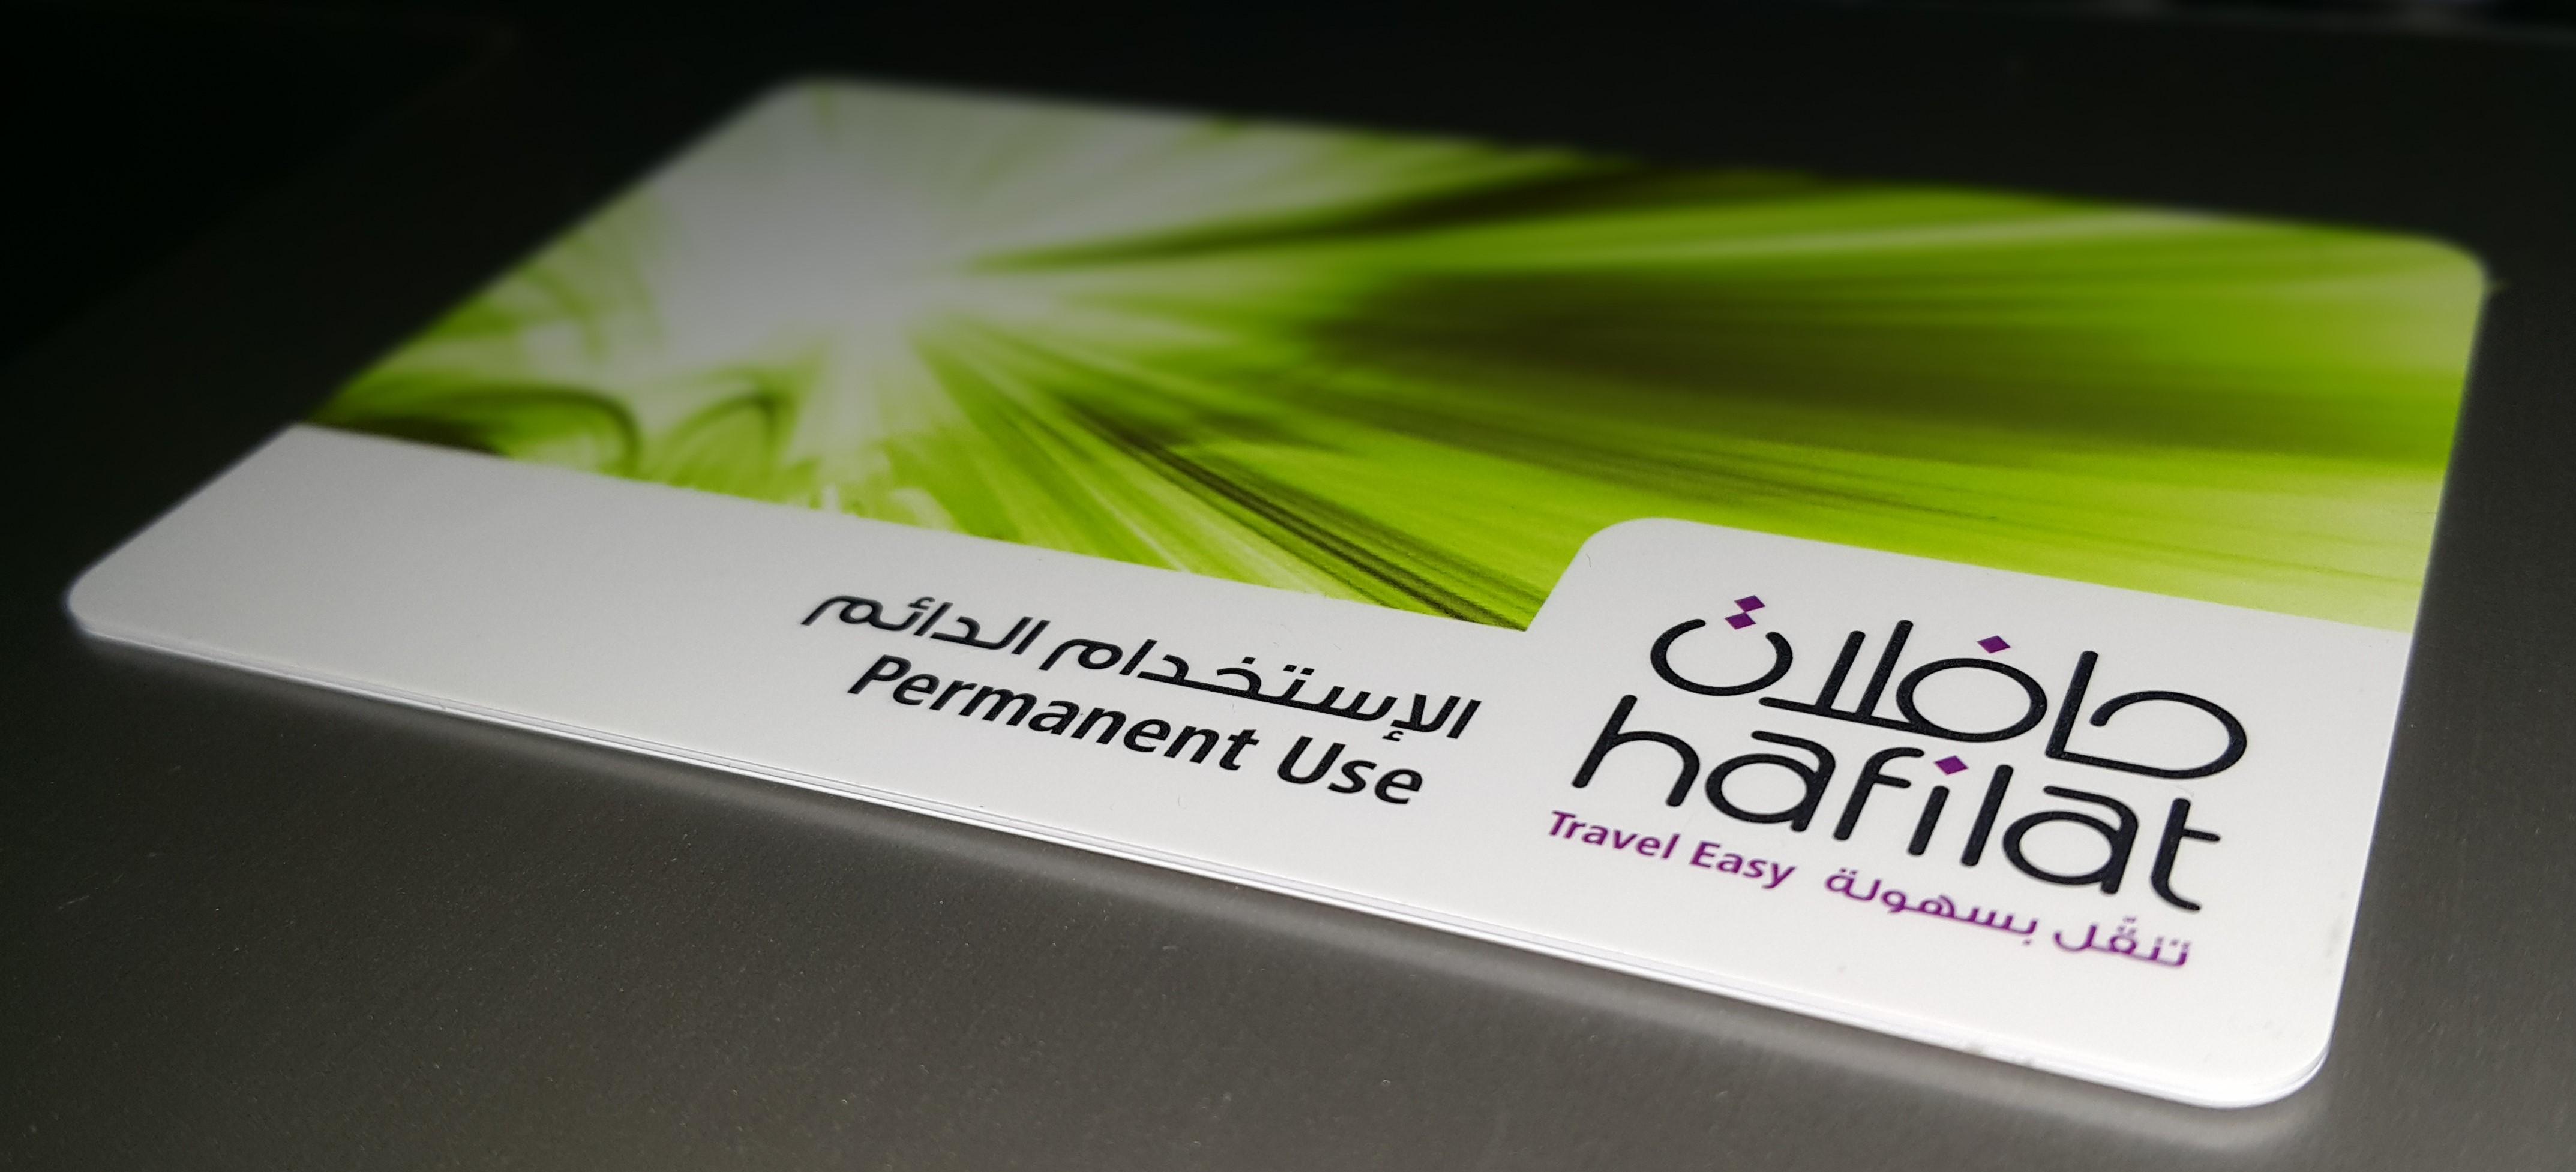 Filea hafilat card abu dhabi bus serviceg wikimedia commons filea hafilat card abu dhabi bus serviceg reheart Image collections